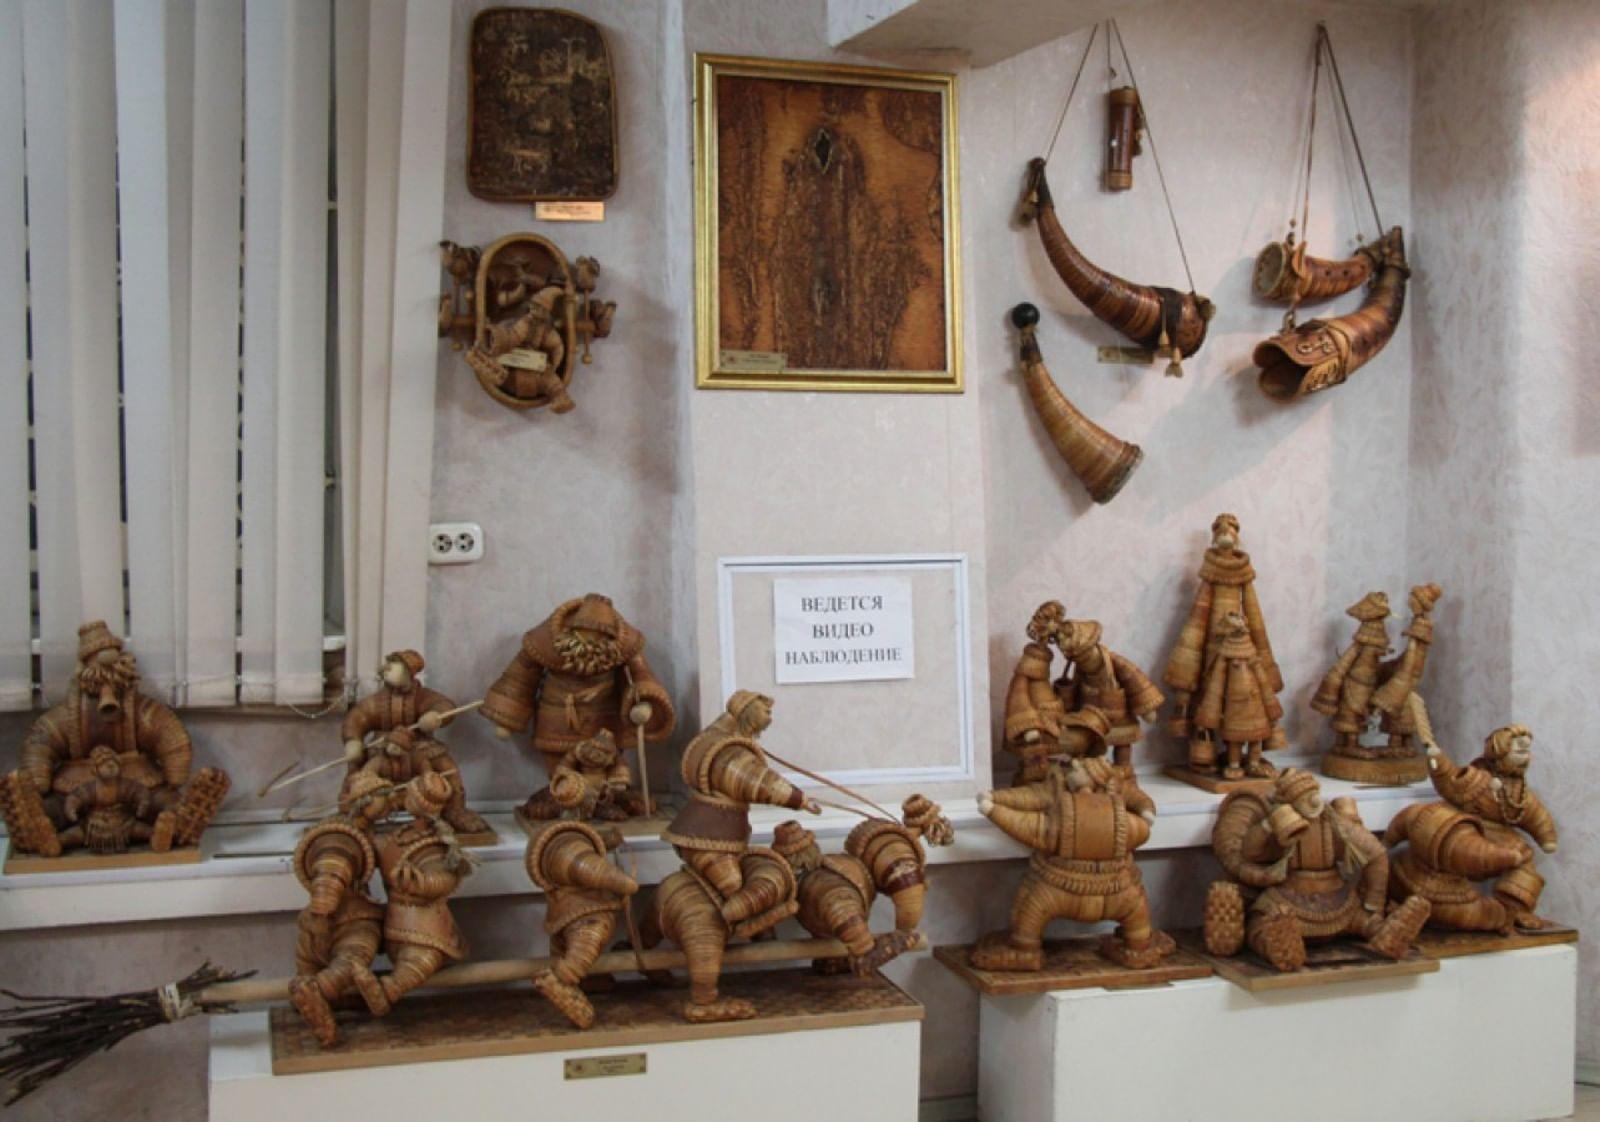 новосибирске береста музея в фото сибирская